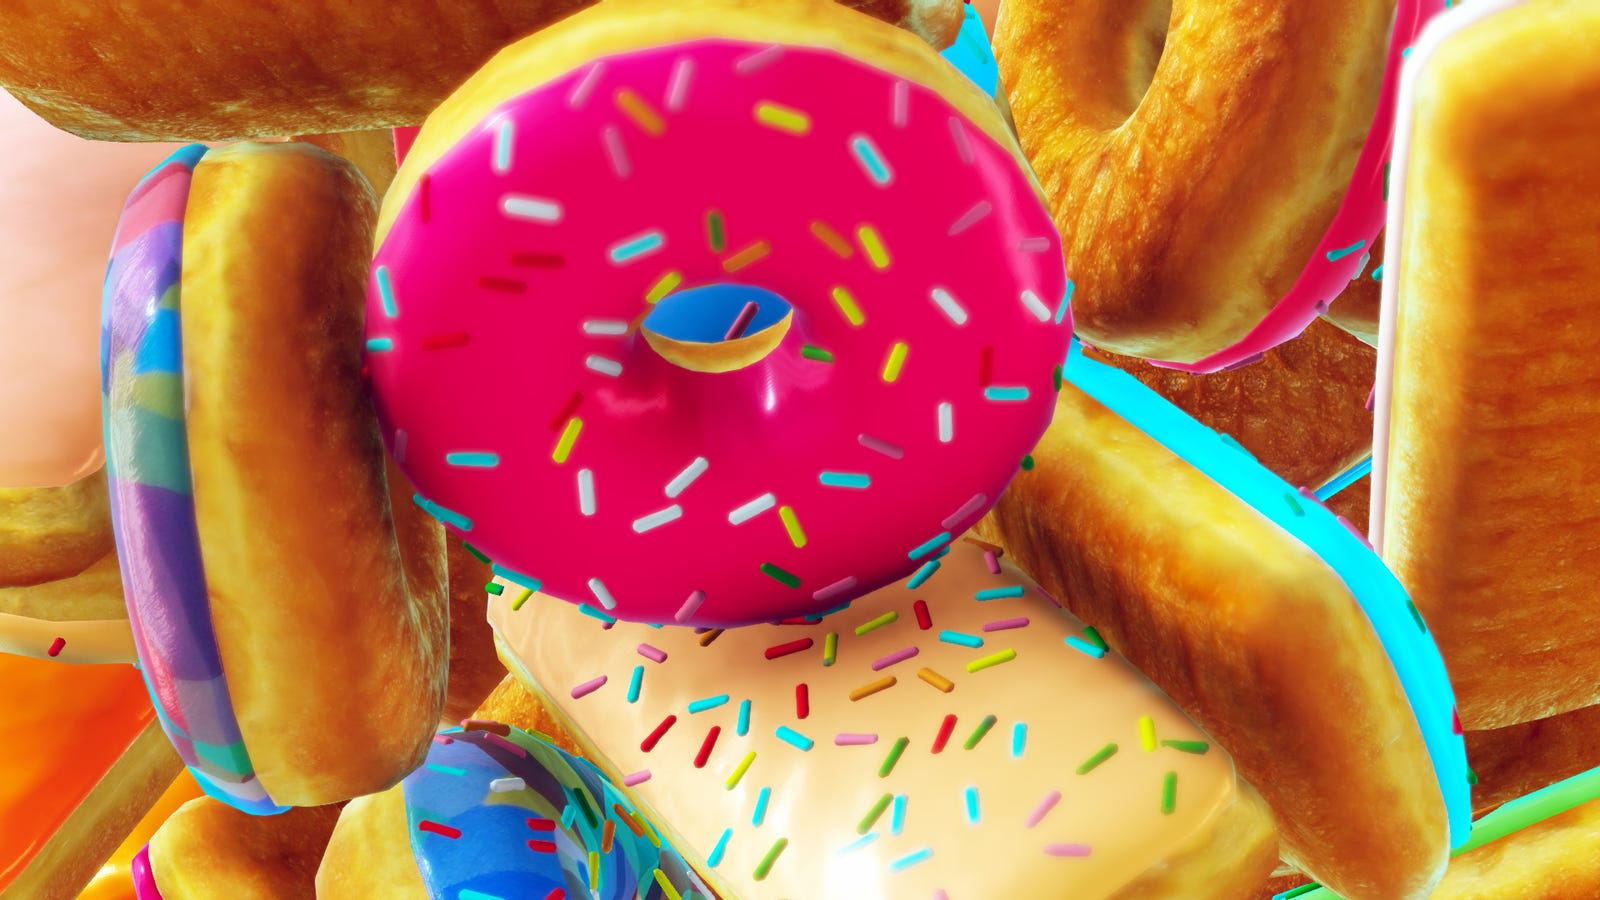 Mmm. Donuts.